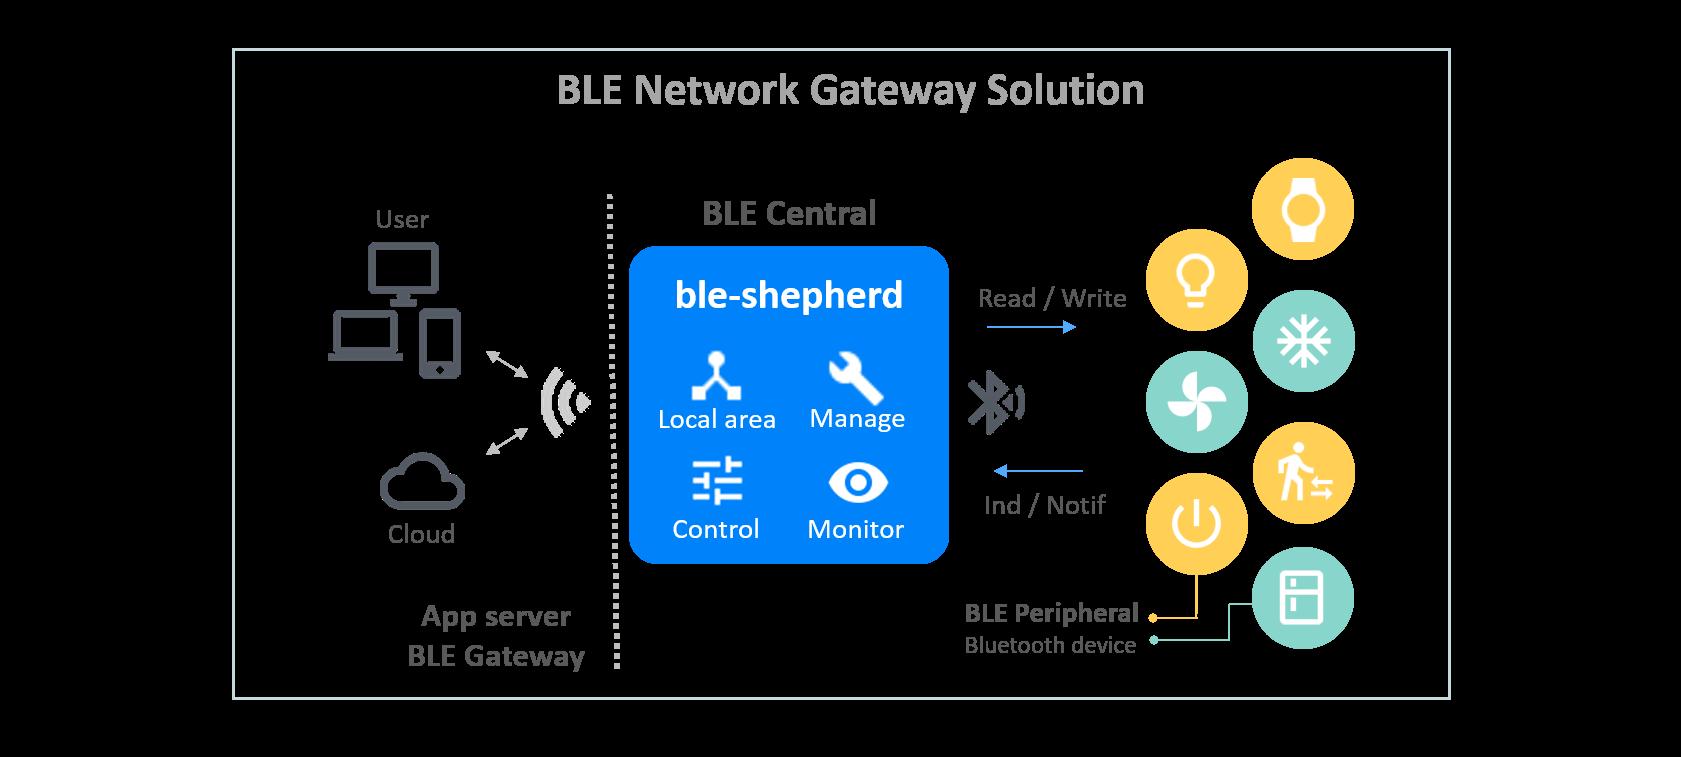 BLE Network